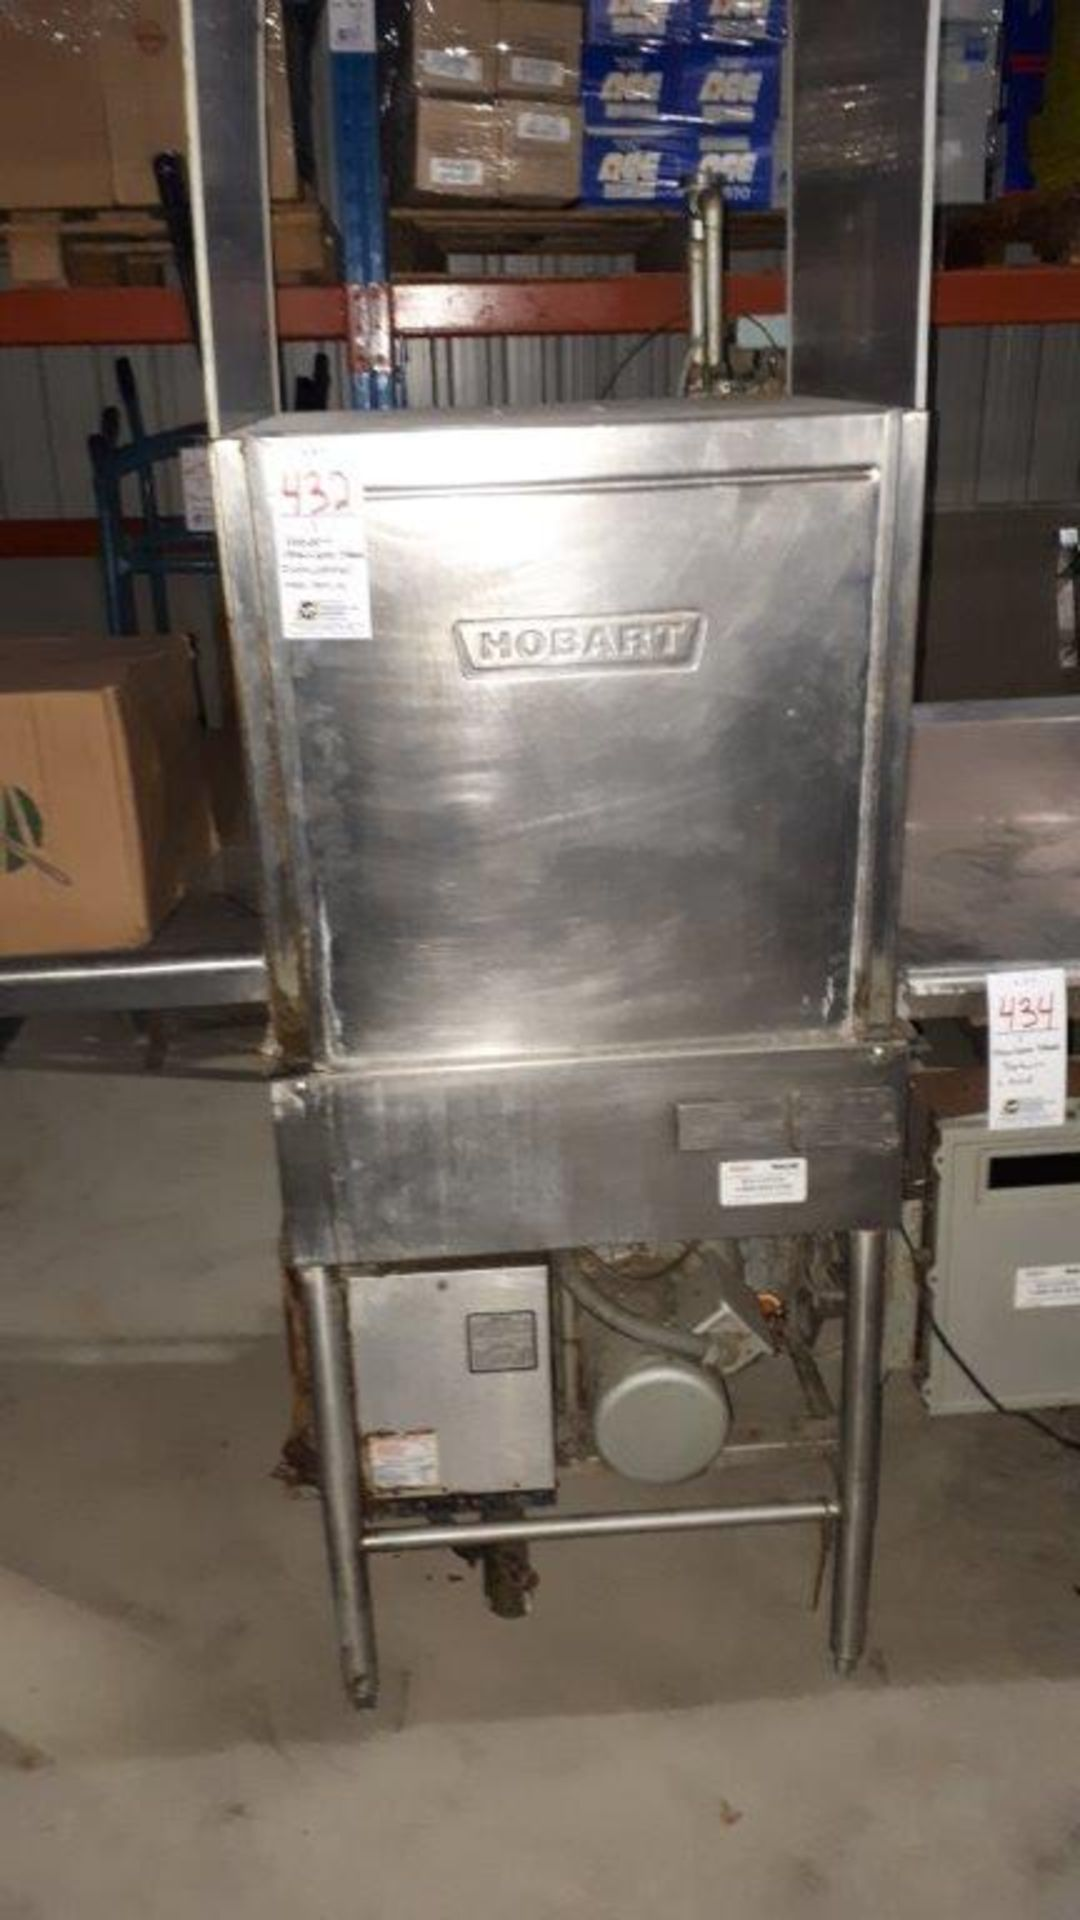 Hobart stainless steel dishwasher, model: AM14